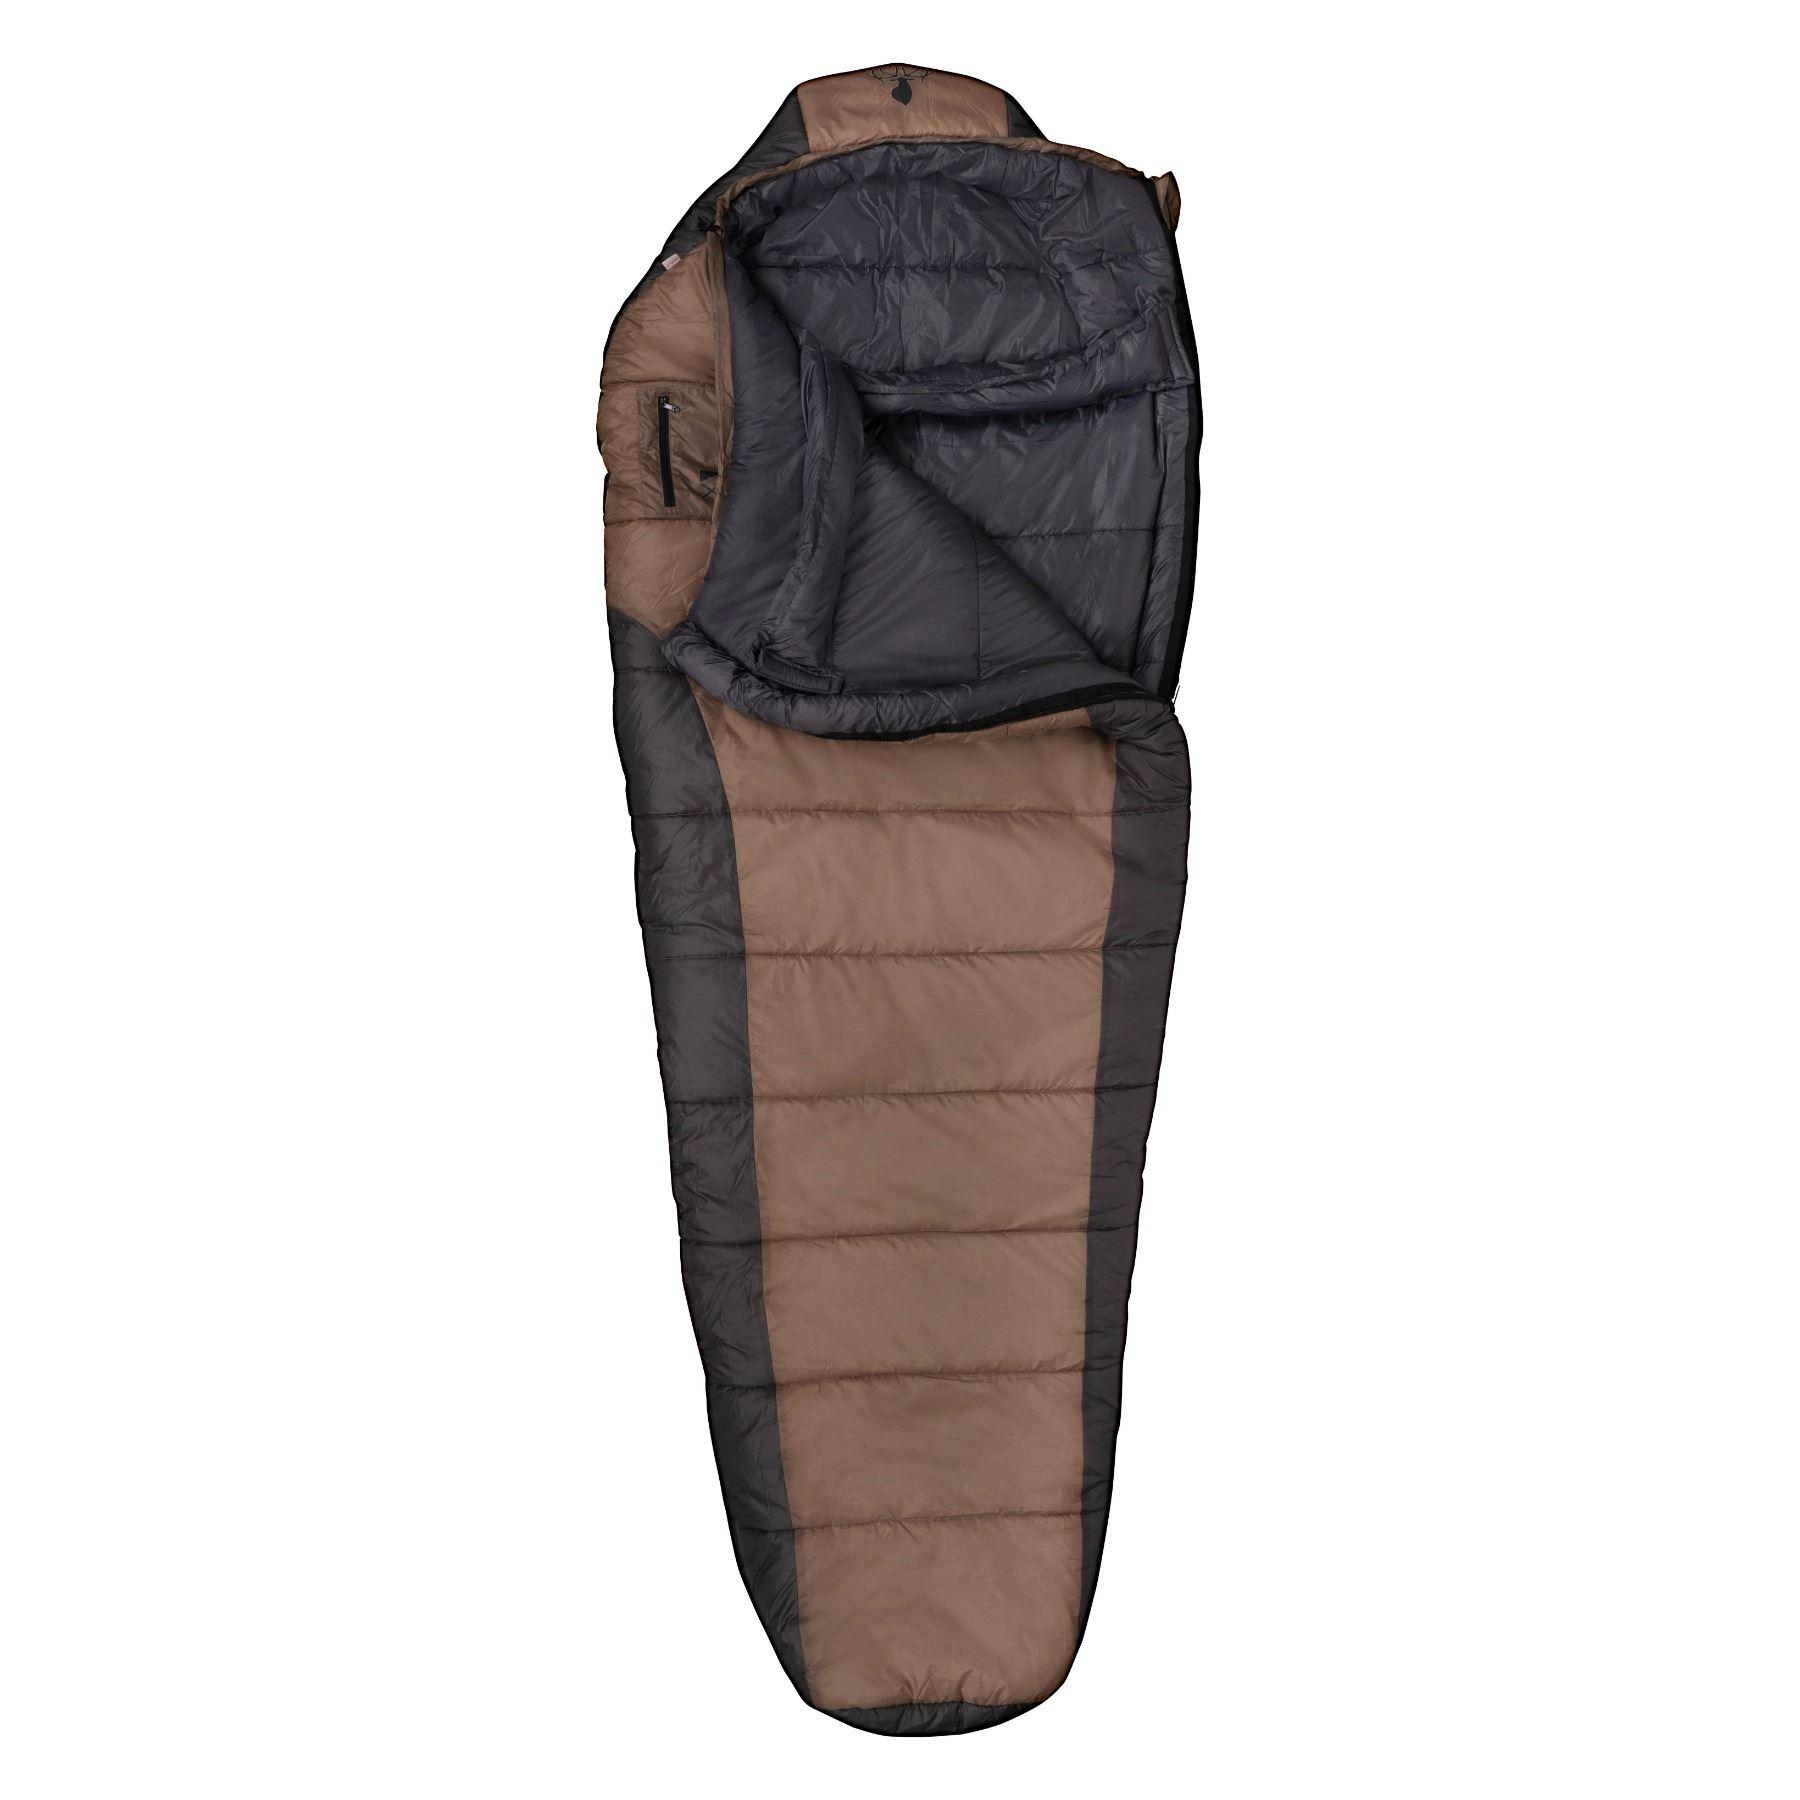 TheXKG Summit 0 Degree Mummy Bag from King's Camo